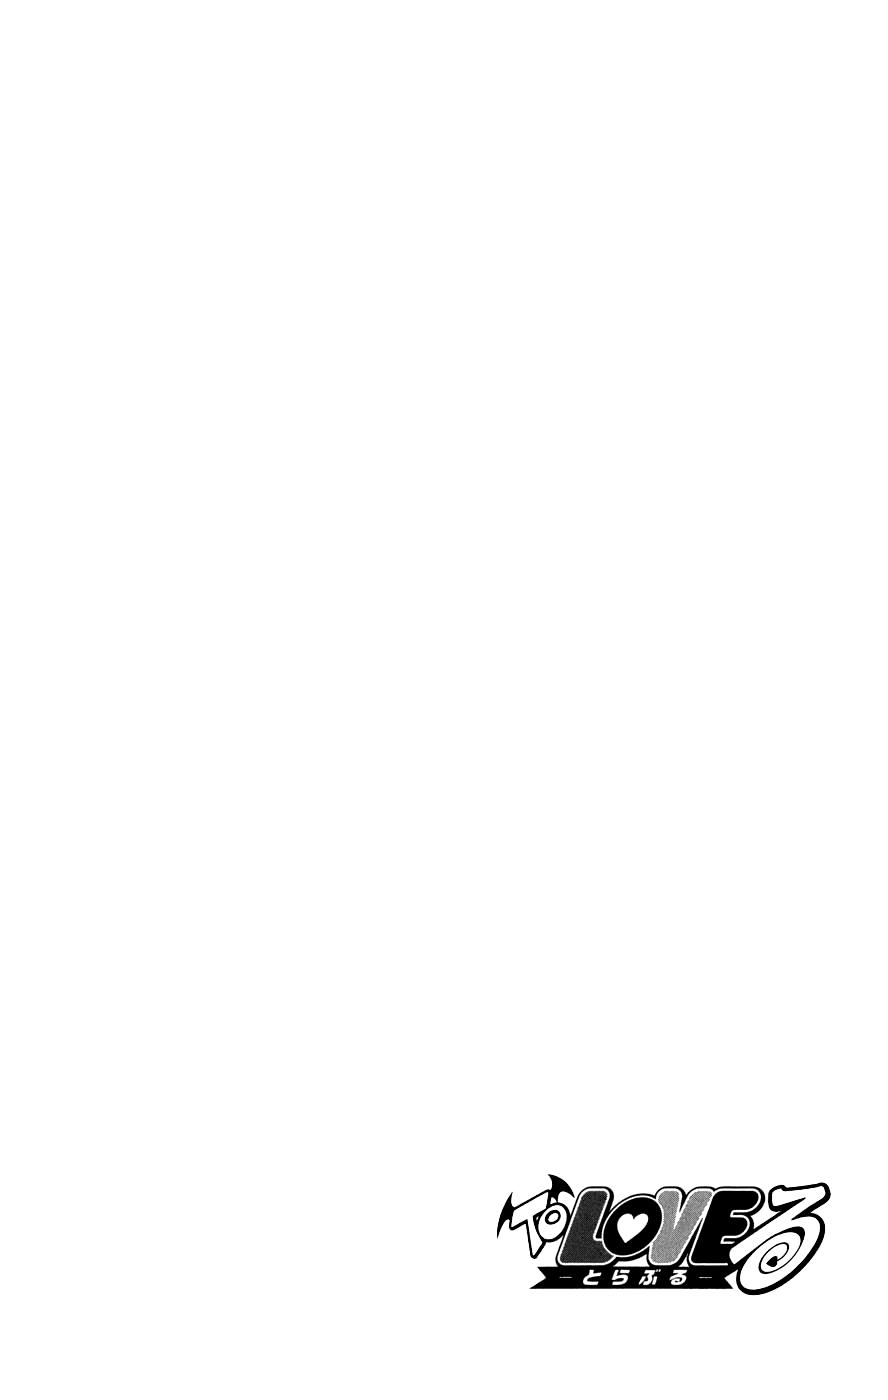 Манга Любовные неприятности / To Love-Ru  - Том 6 Глава 45 Страница 19